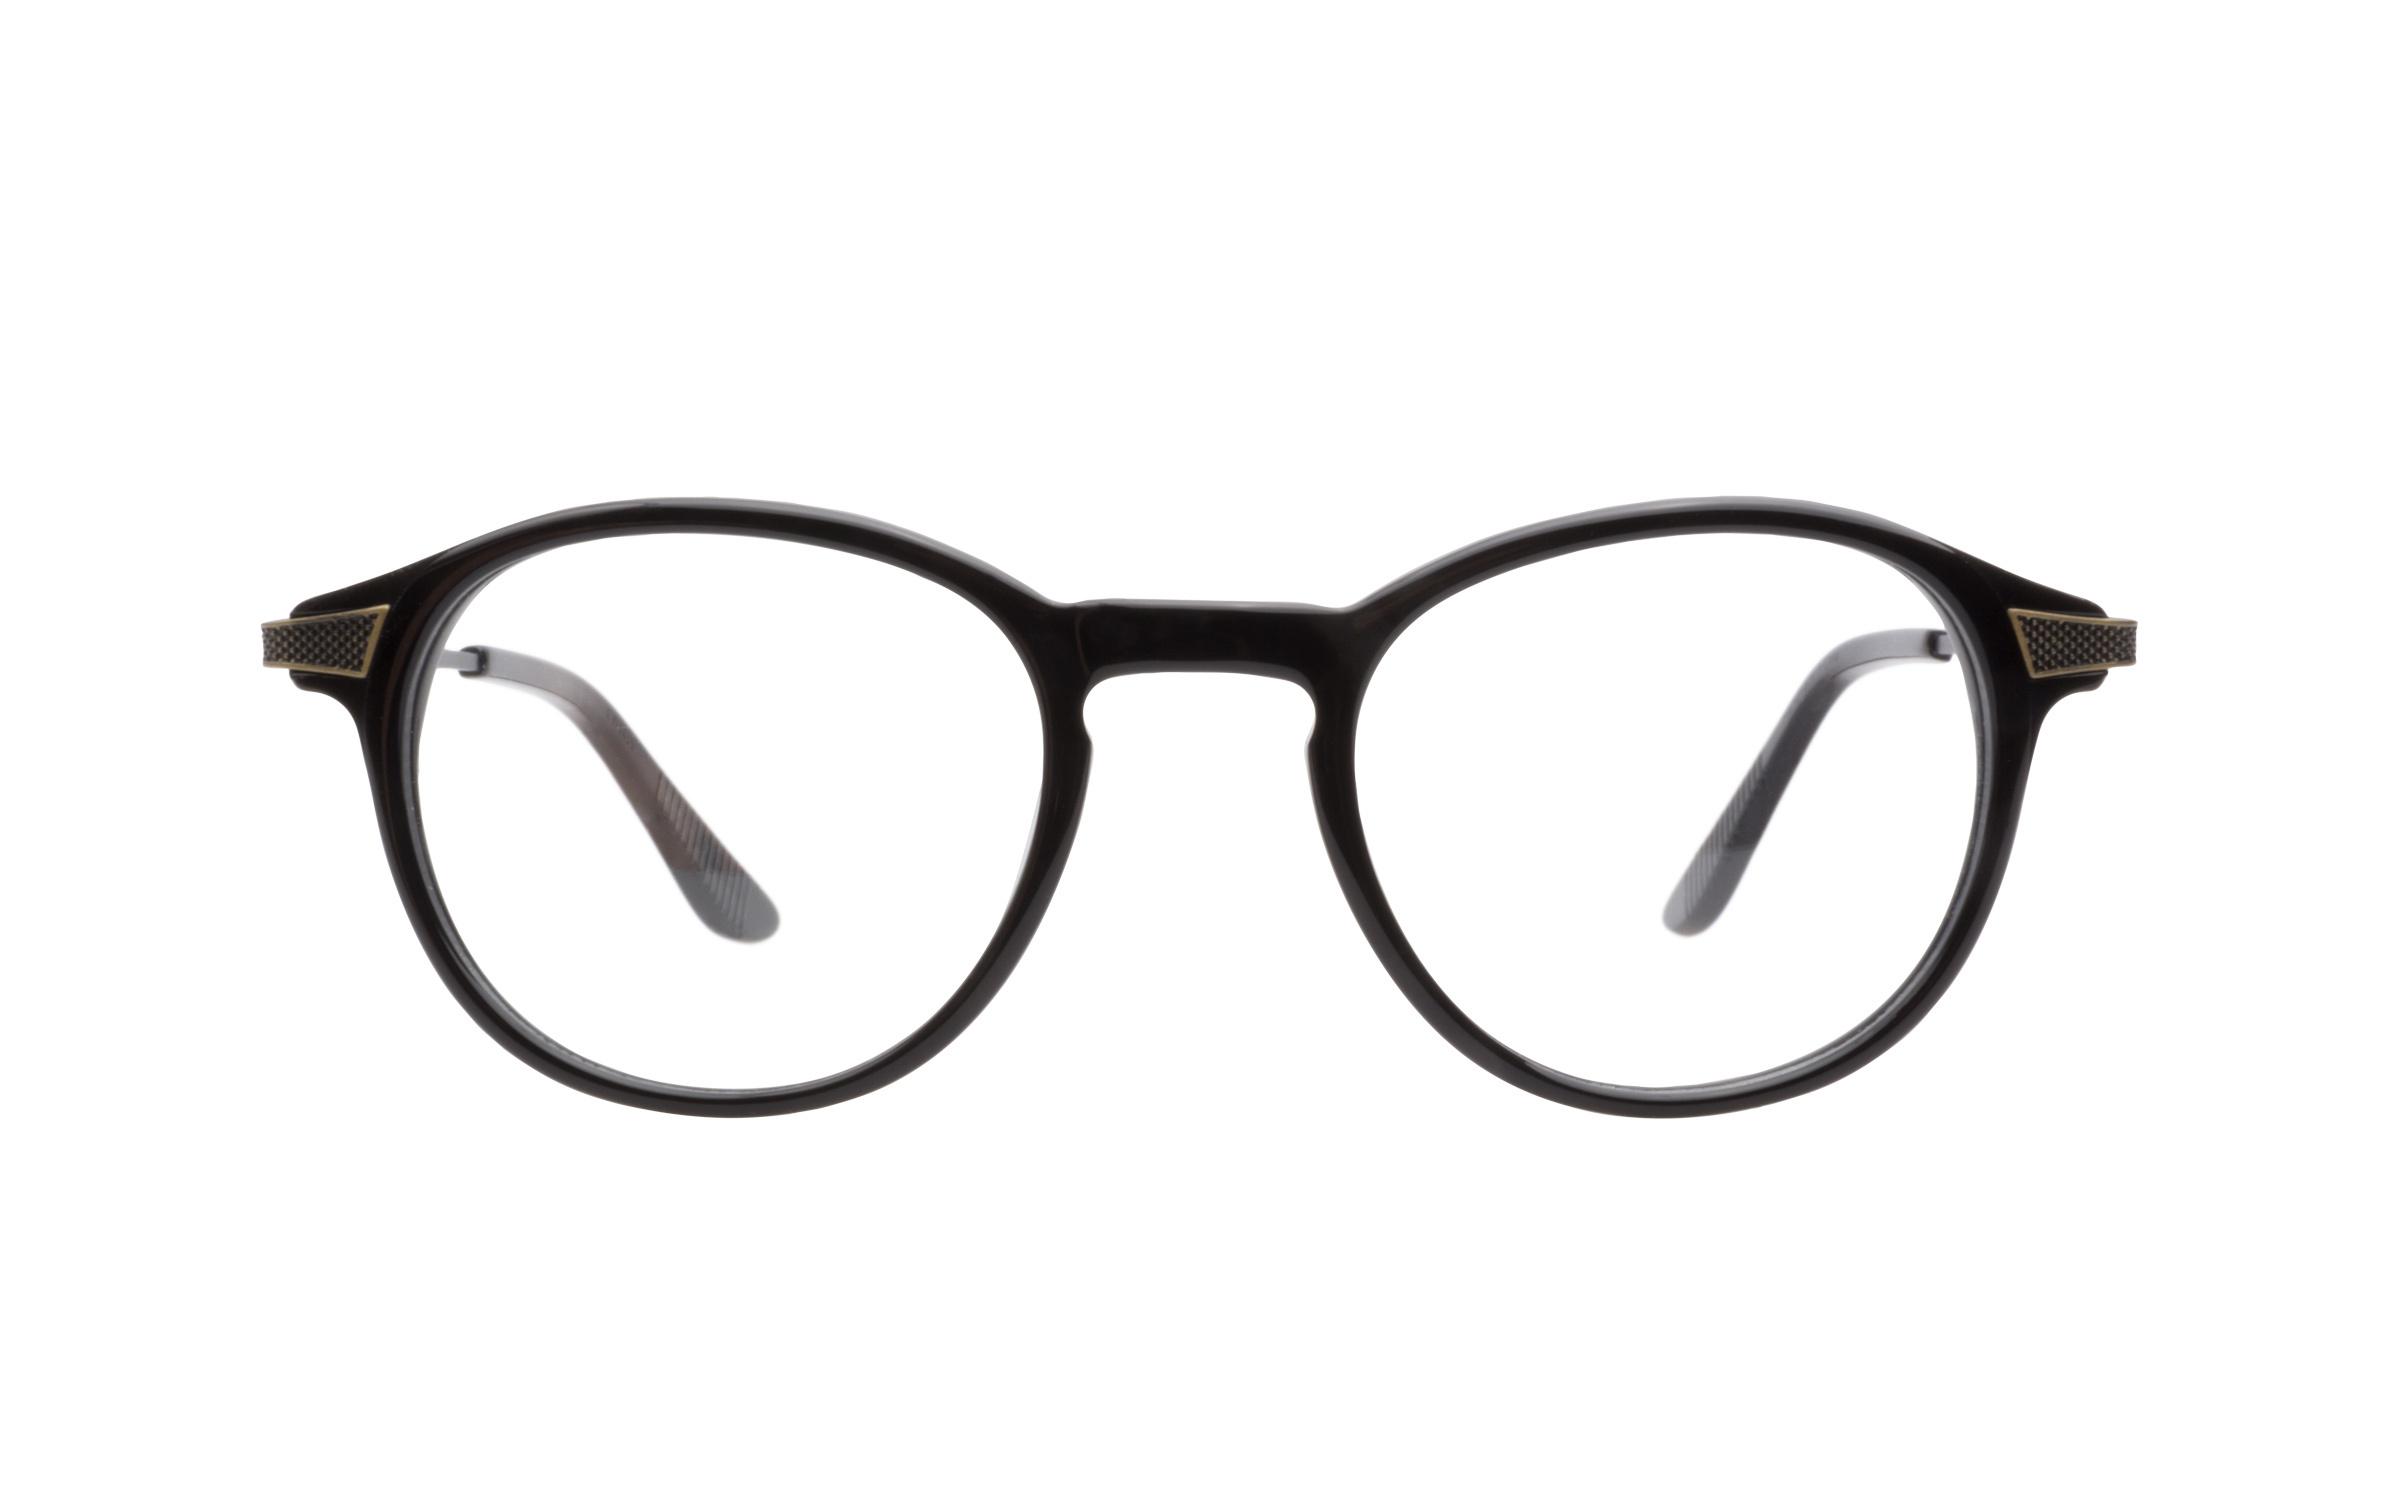 Mens_Round_Glasses_Black_Joseph_Marc_Online_Coastal